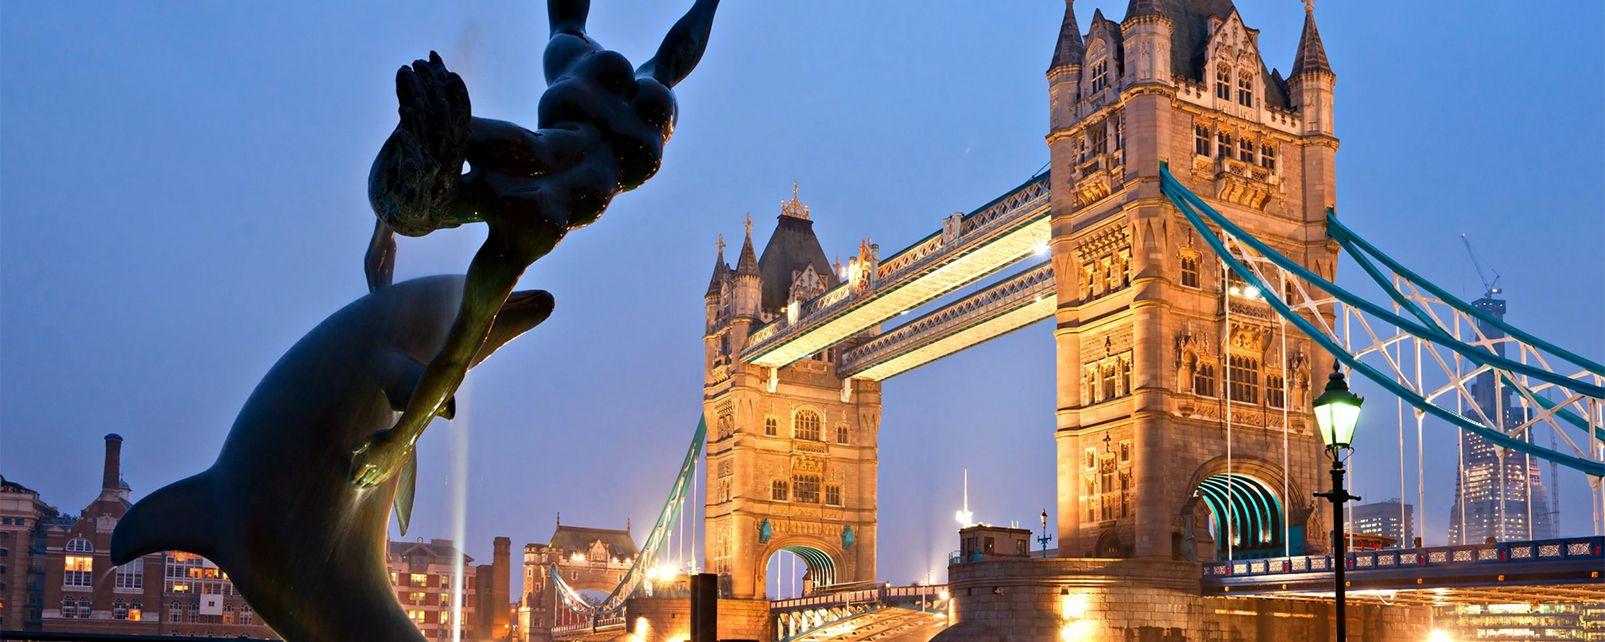 LONDRA & OLD ENGLAND